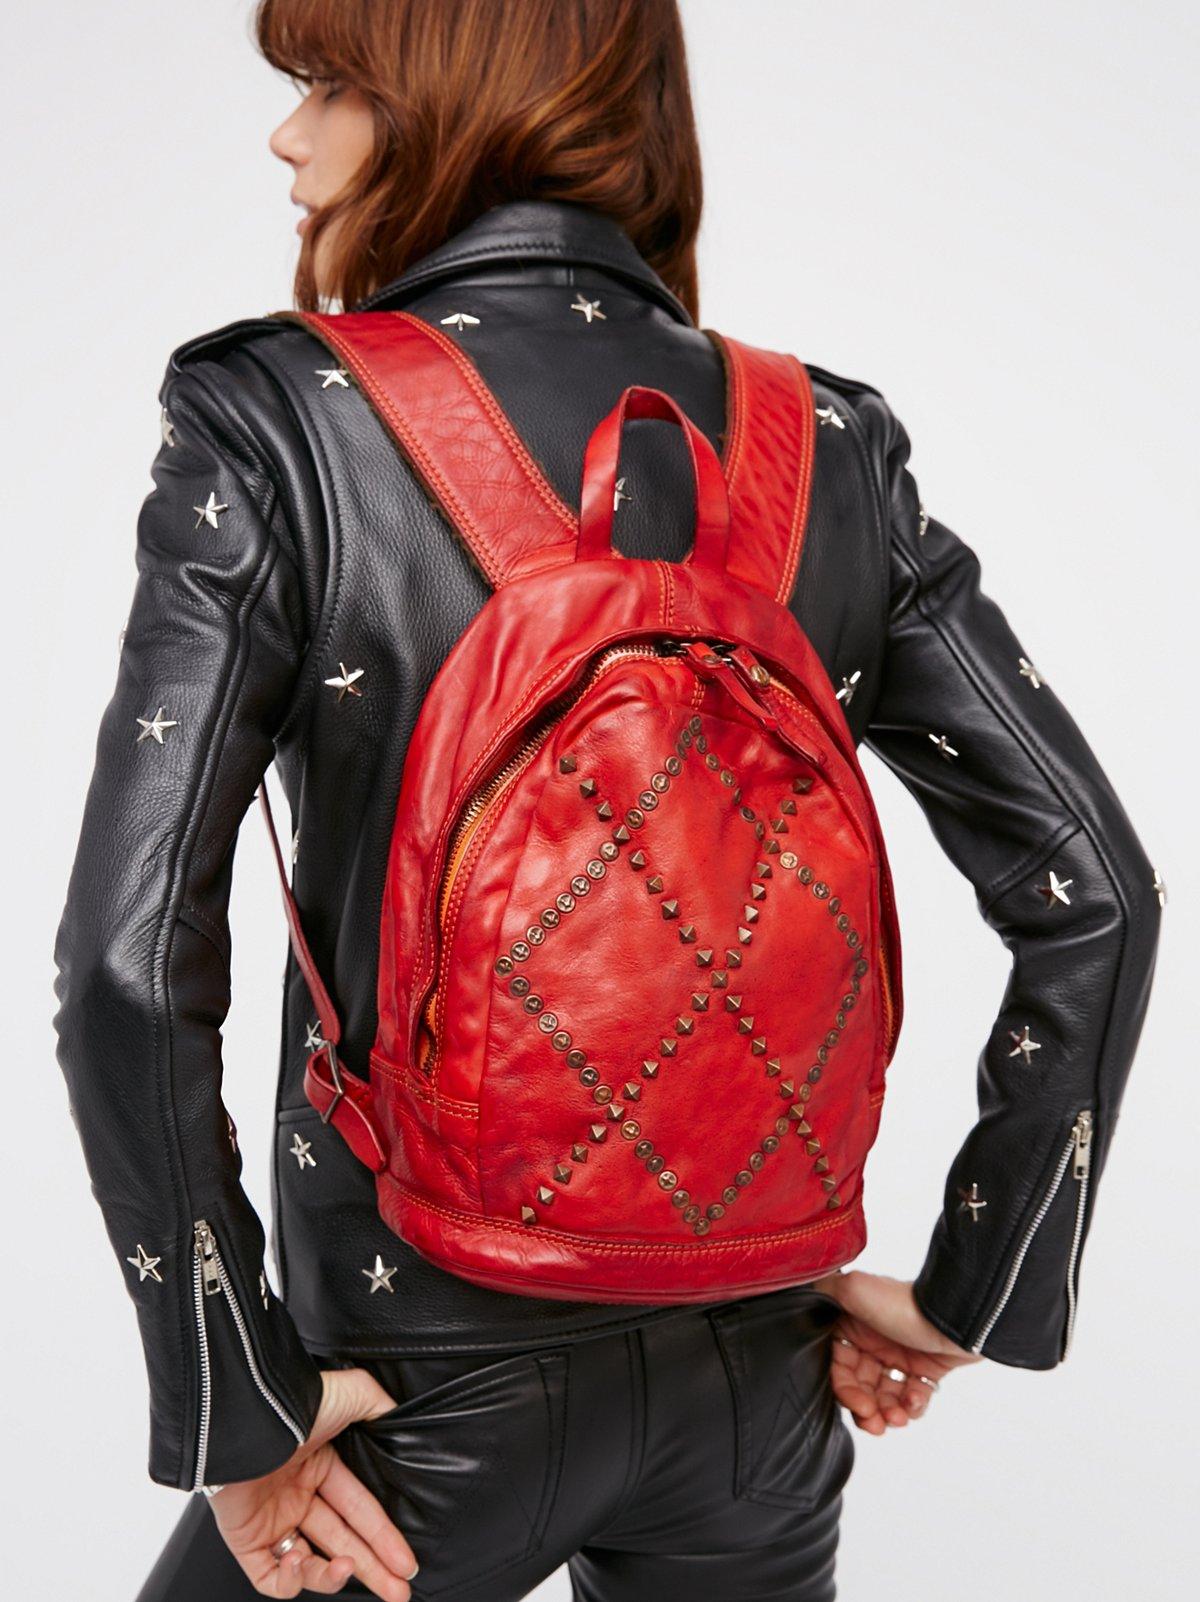 Verona Leather Backpack